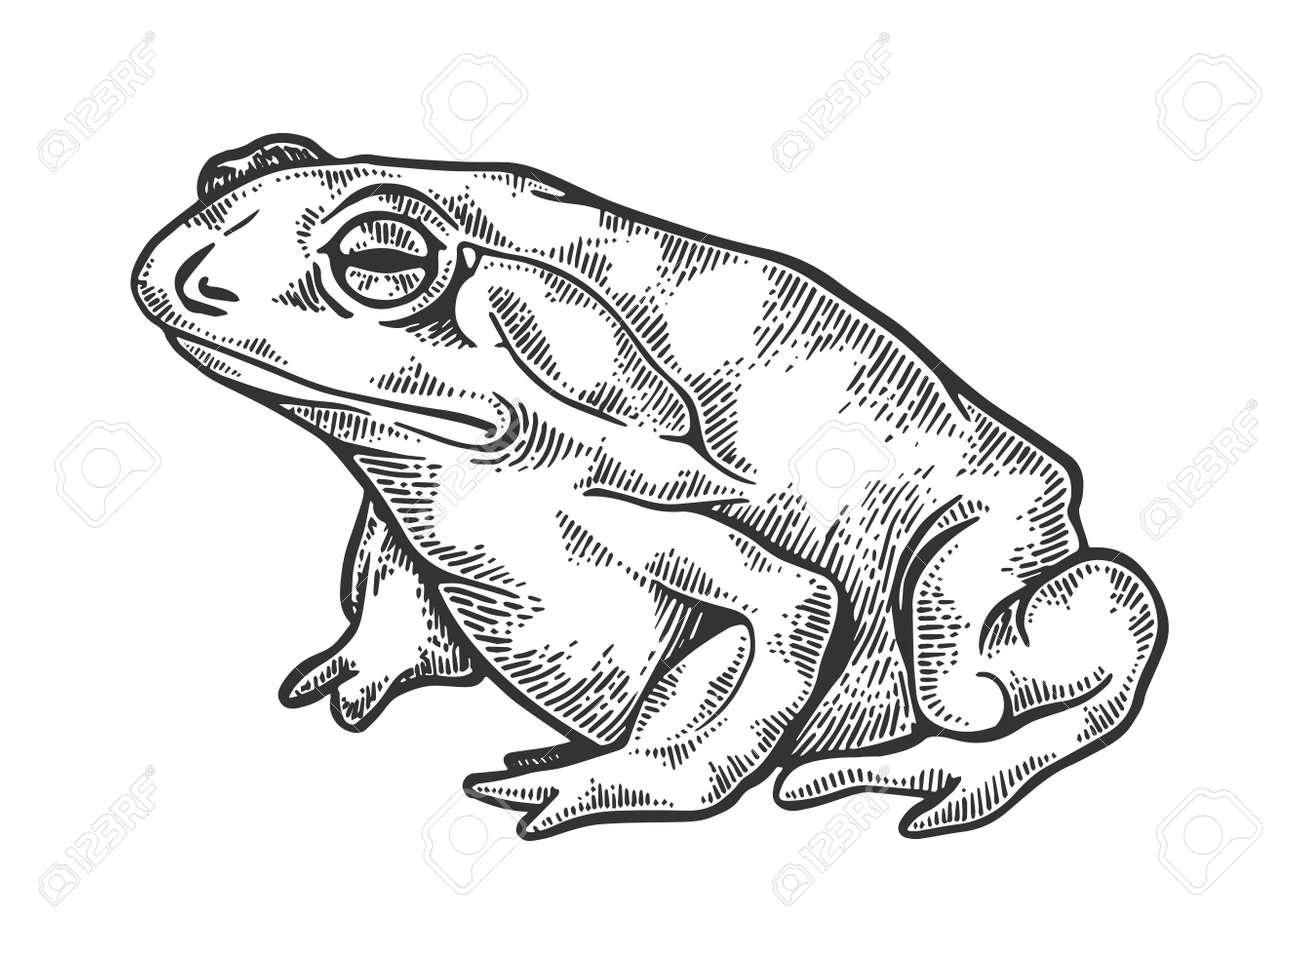 Hallucinogenic toad engraving vector illustration - 102399446